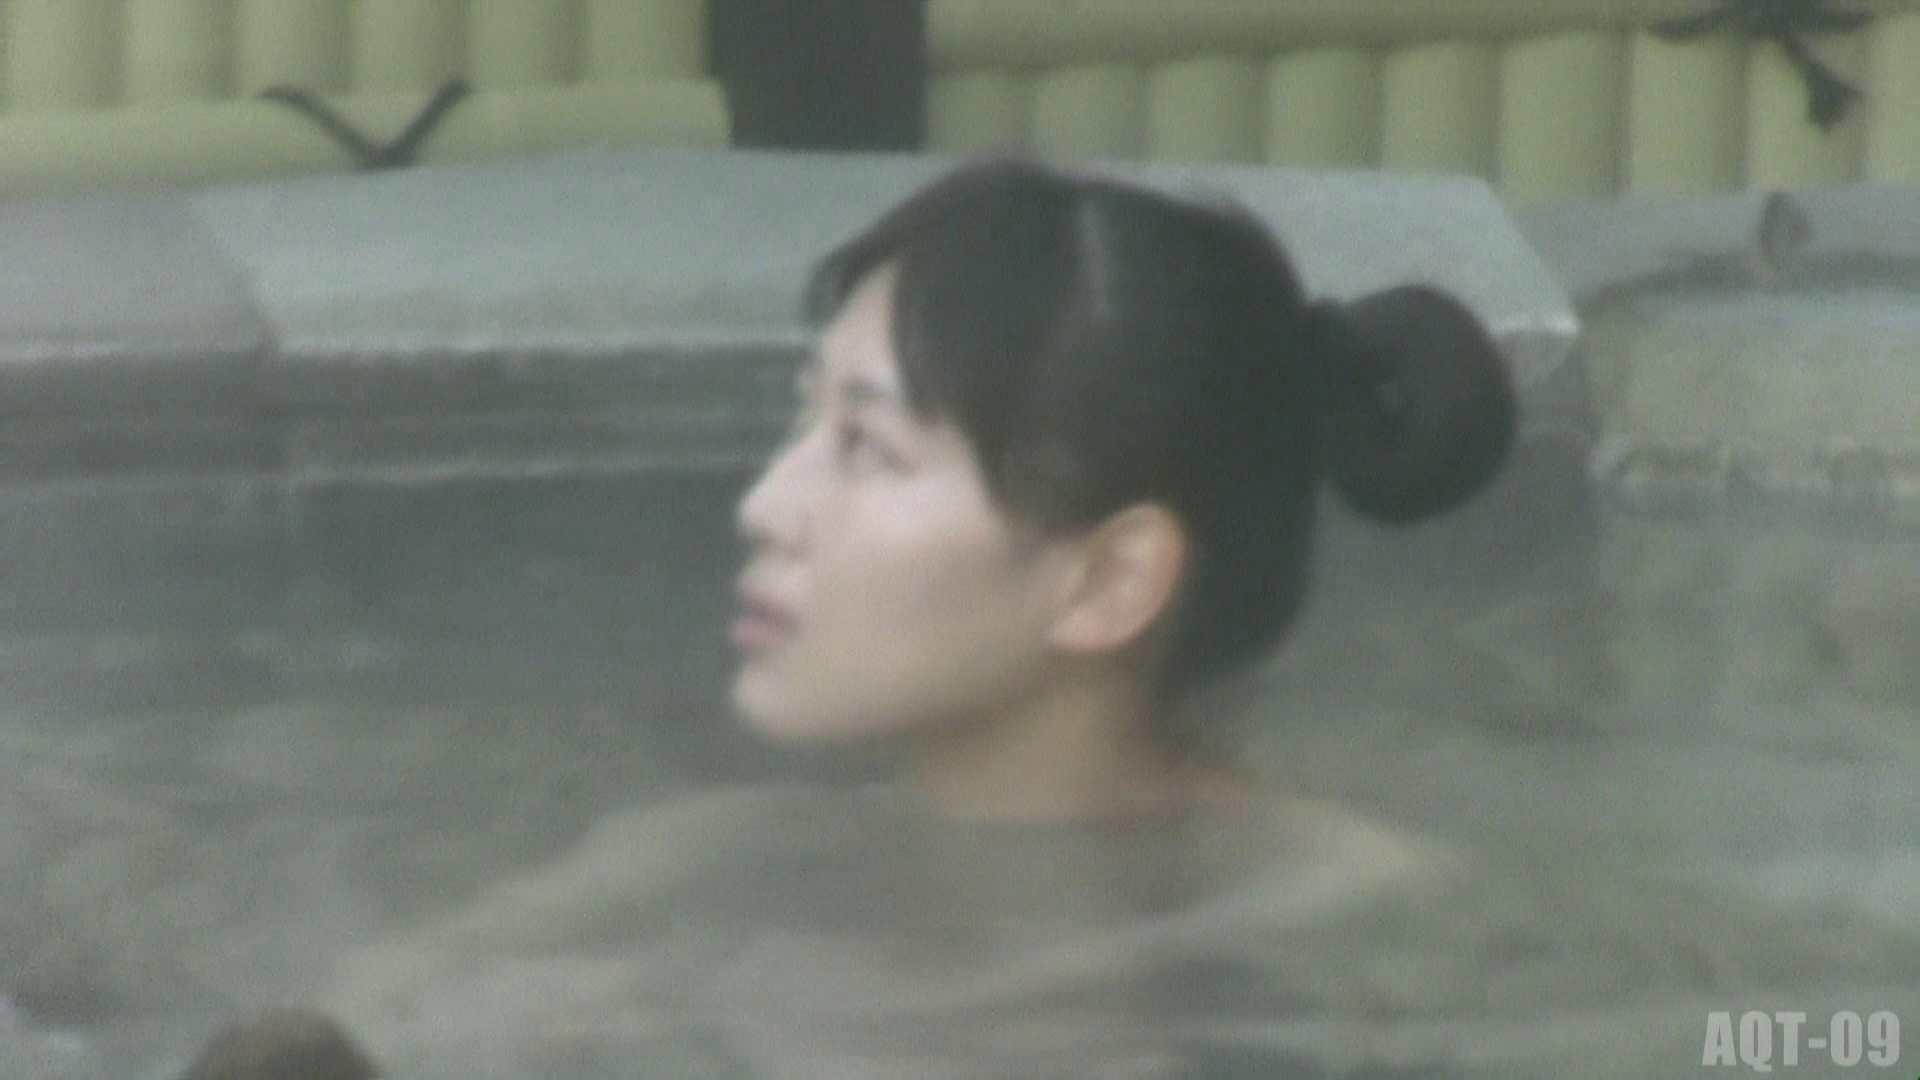 Aquaな露天風呂Vol.785 露天風呂編  110PIX 4